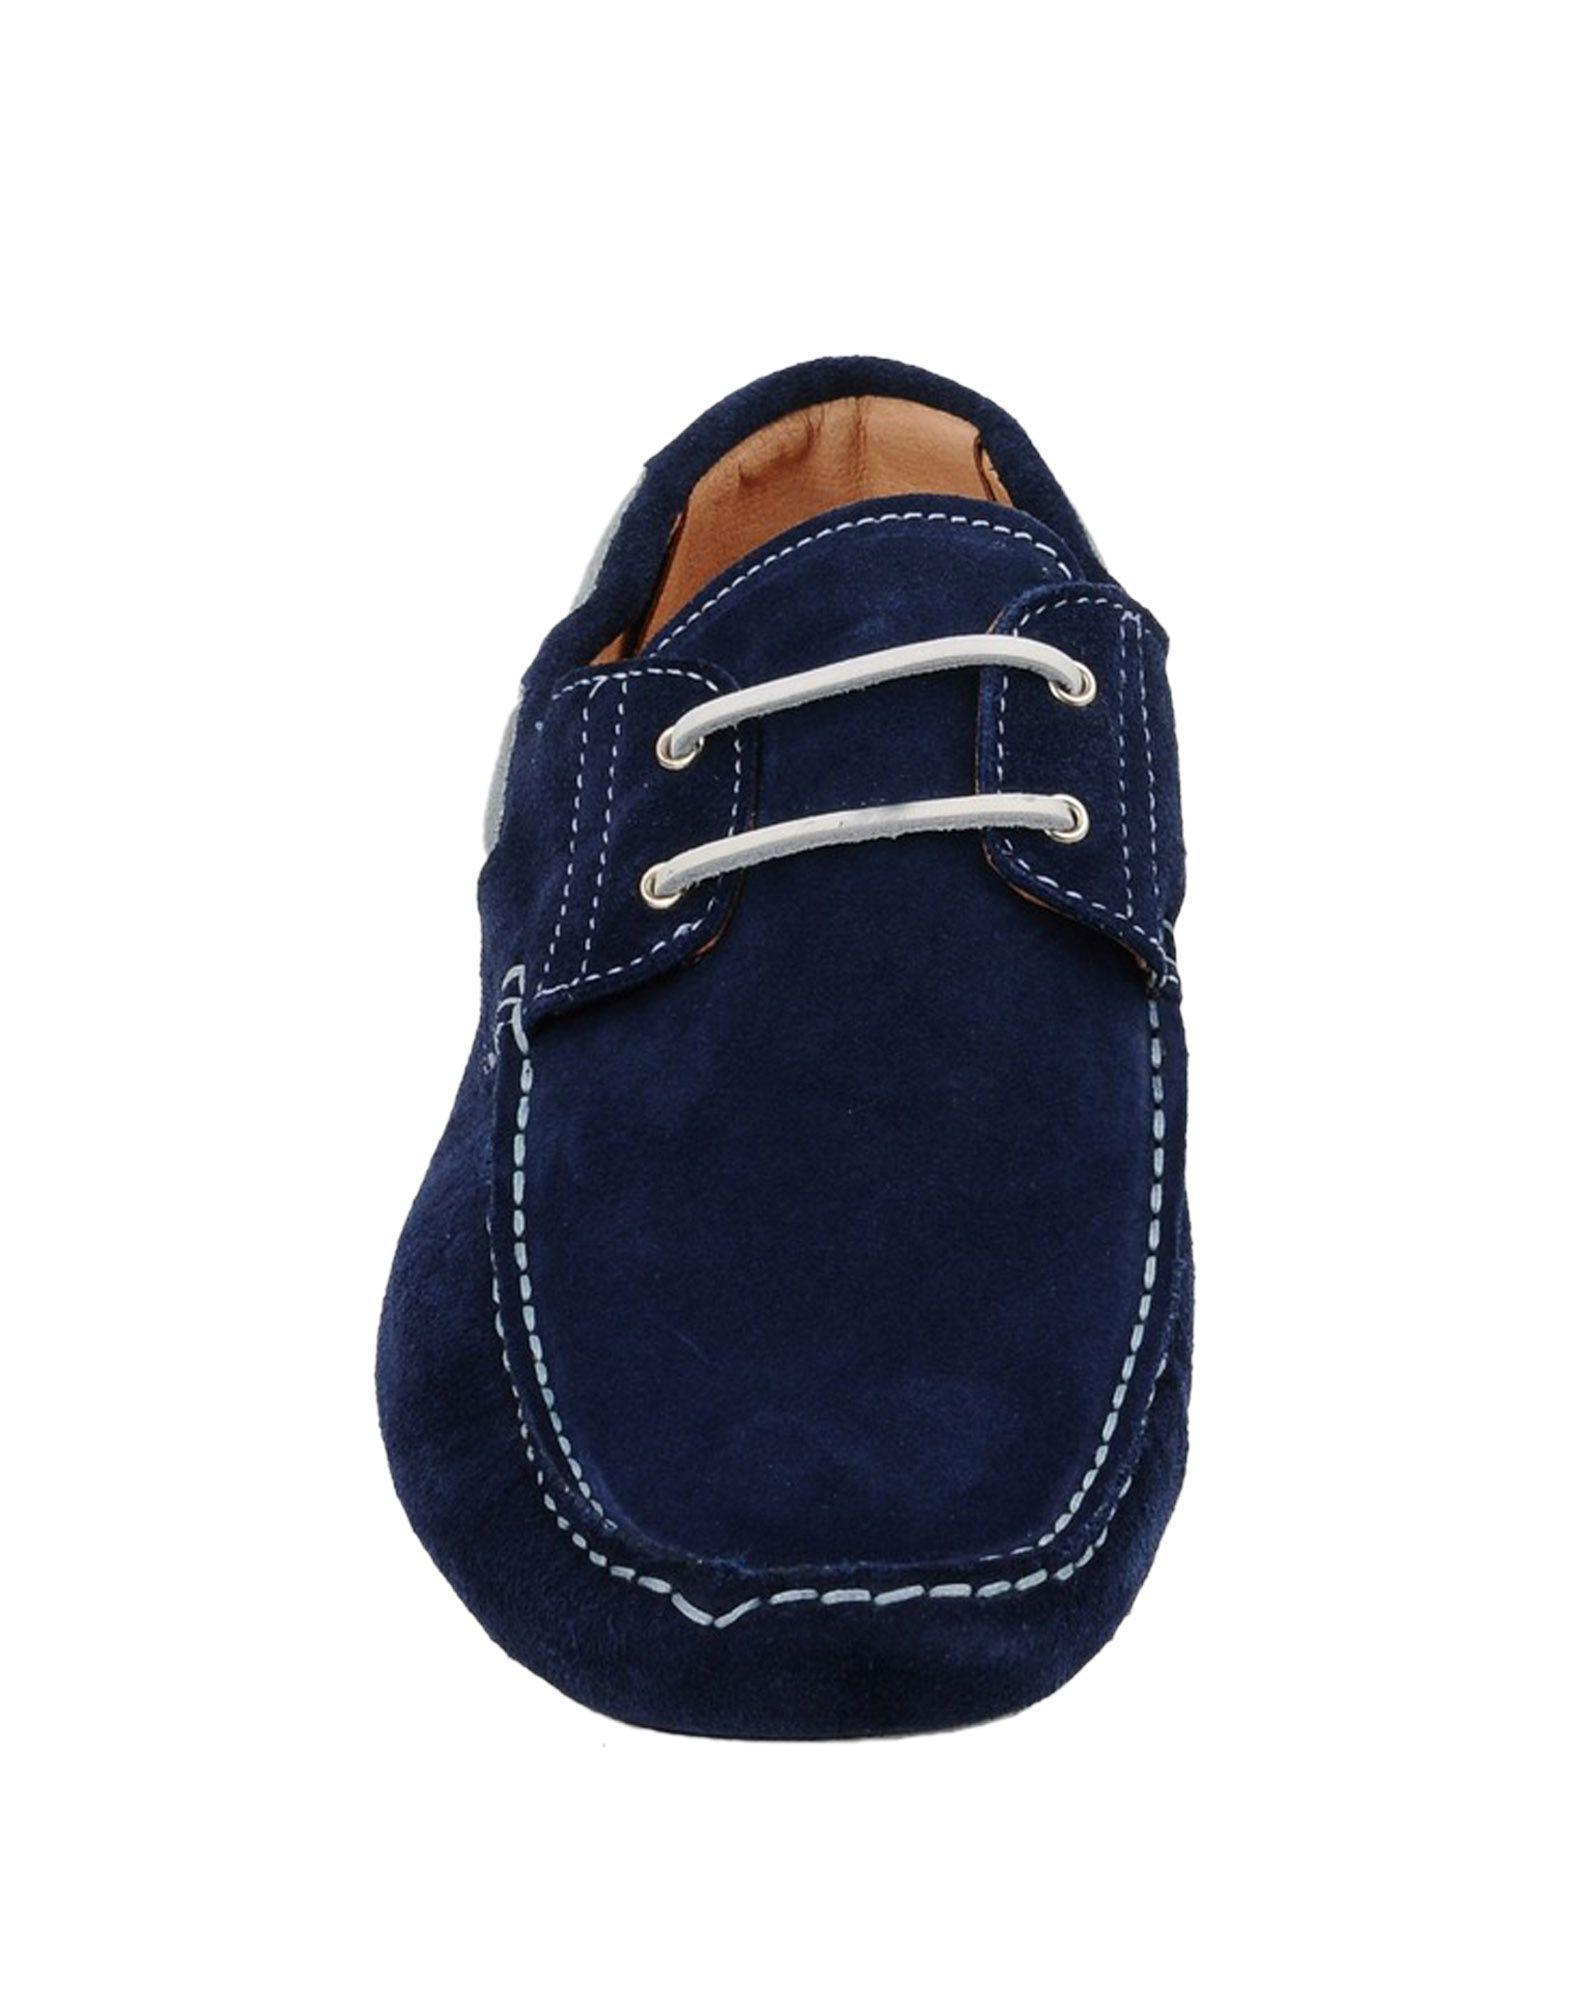 8 Suede Loafers in Dark Blue (Blue) for Men